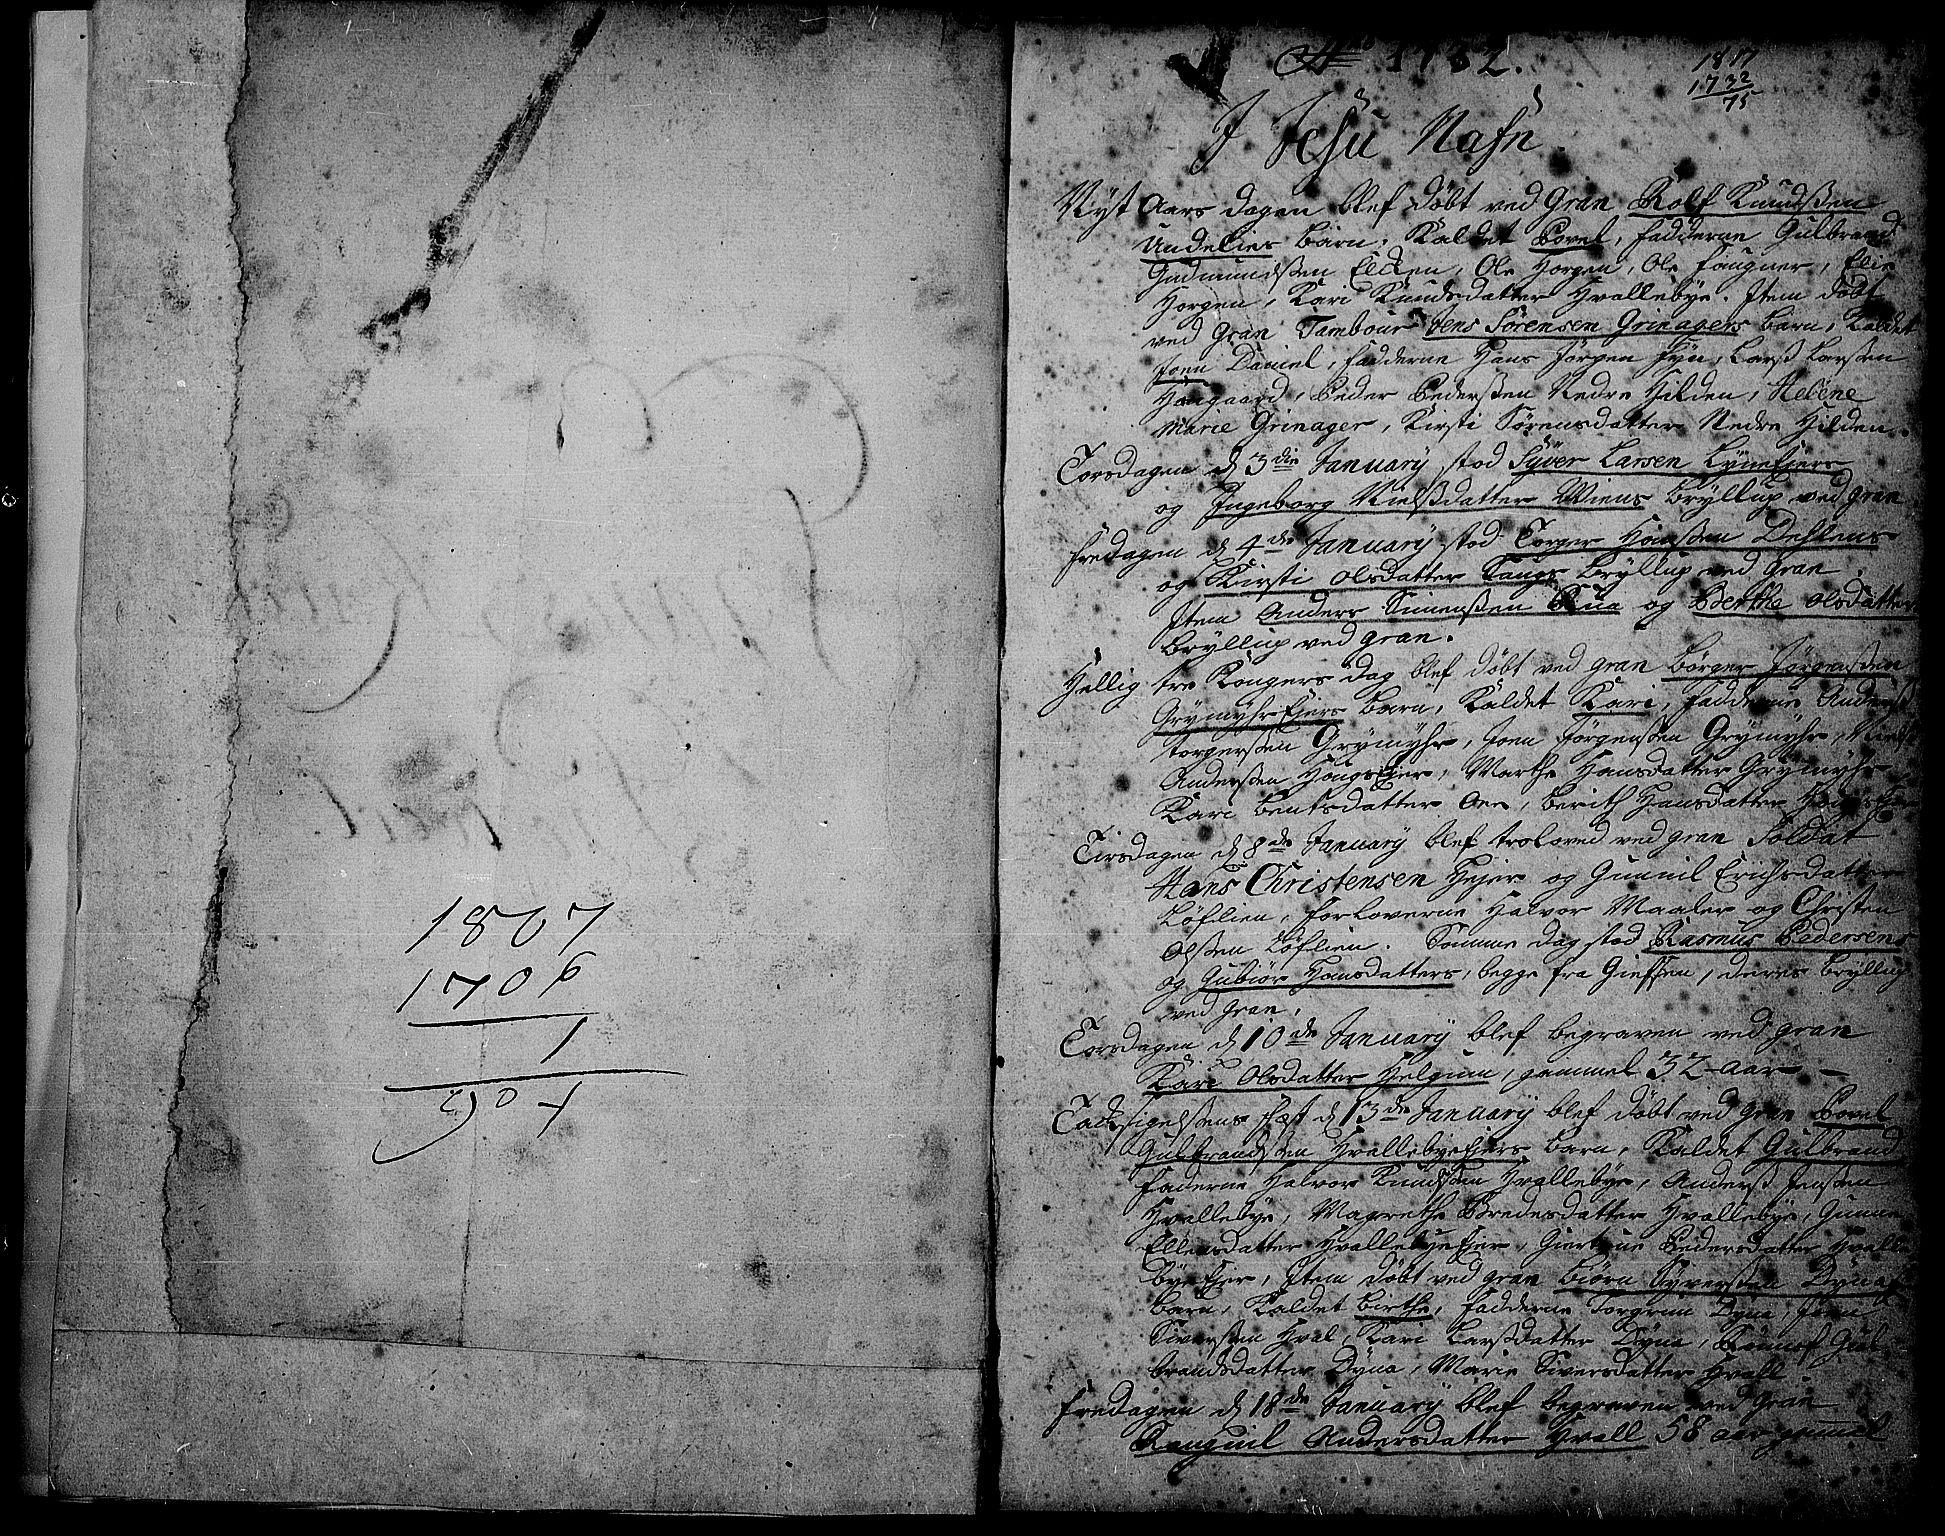 SAH, Gran prestekontor, Ministerialbok nr. 2, 1732-1744, s. 1